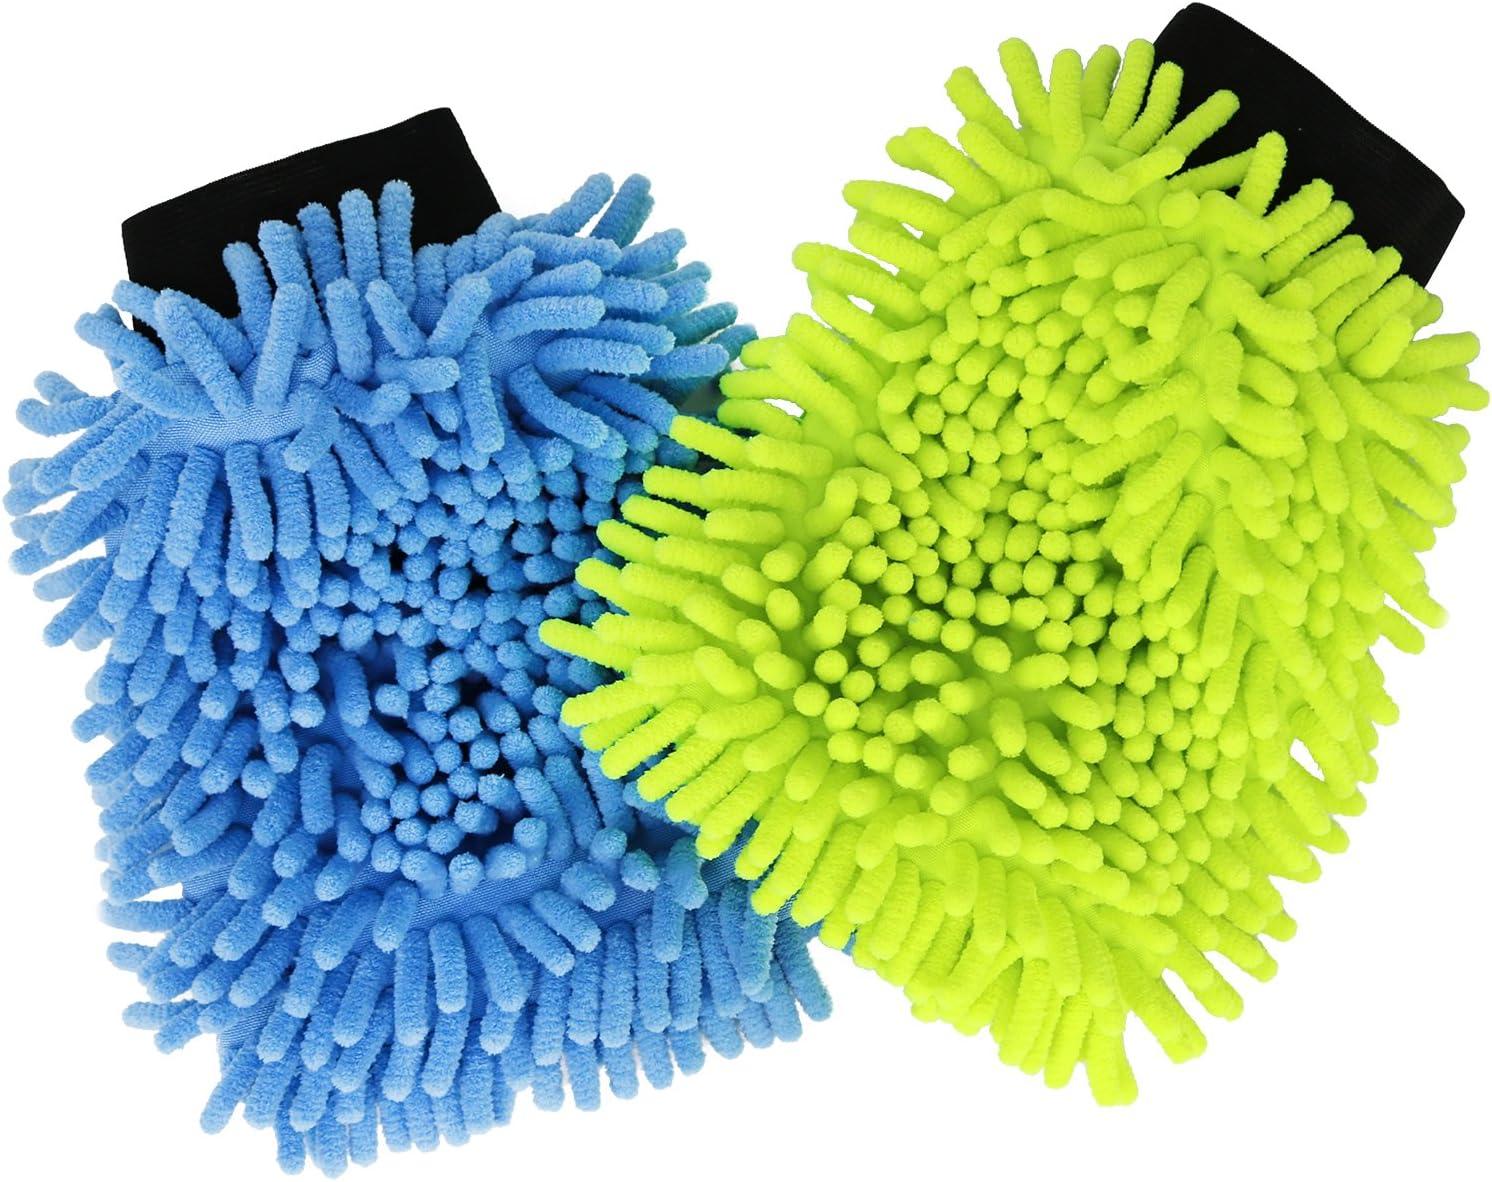 06-piece - Car wash set com-four/® 6-piece car wash set with washing gloves and microfibre cloth for car care